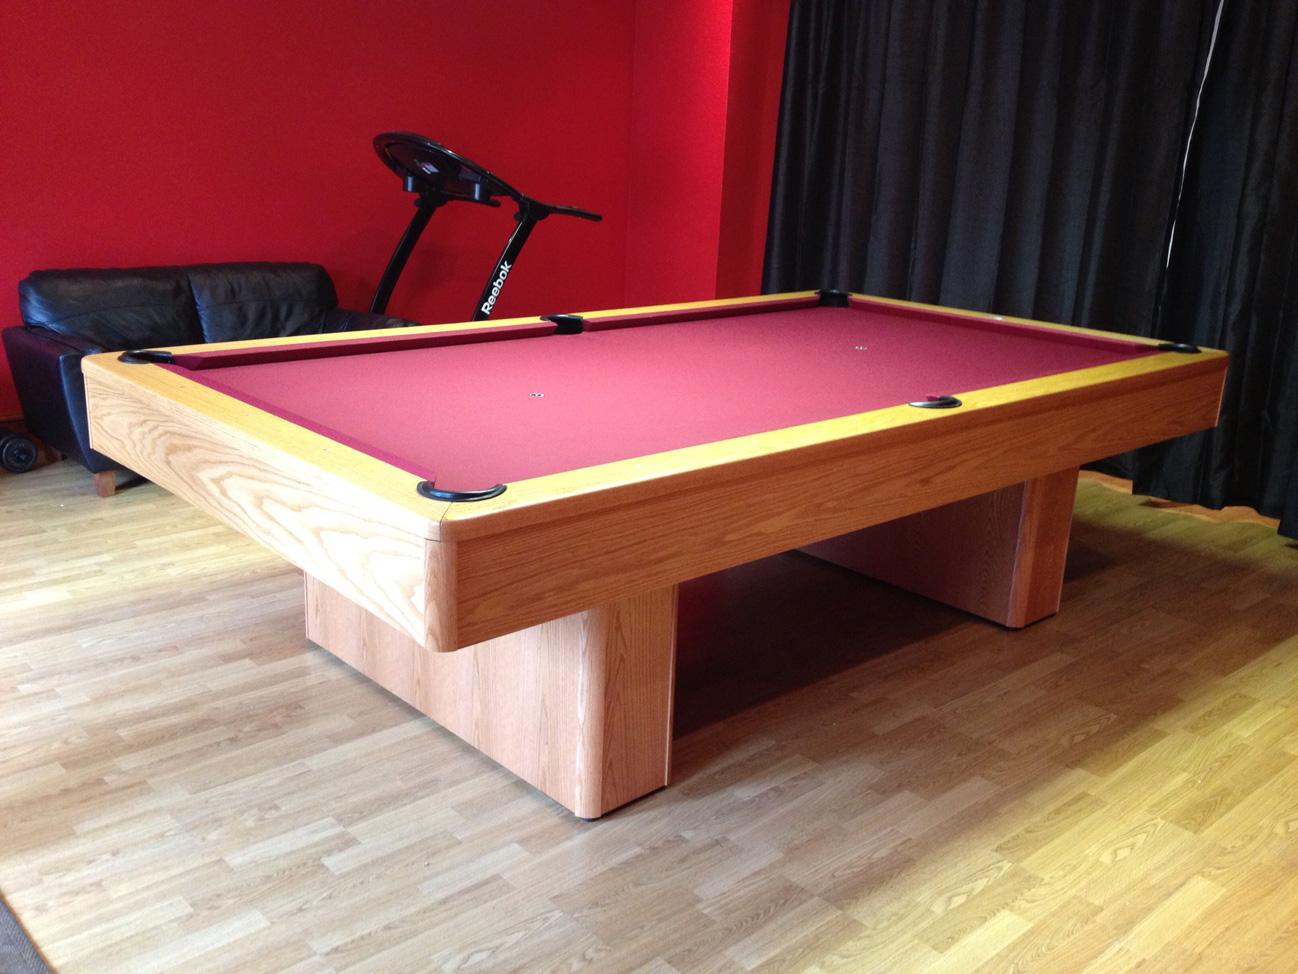 Olhausen Monarch Pool Table In Oak American Pool Table - Monarch pool table